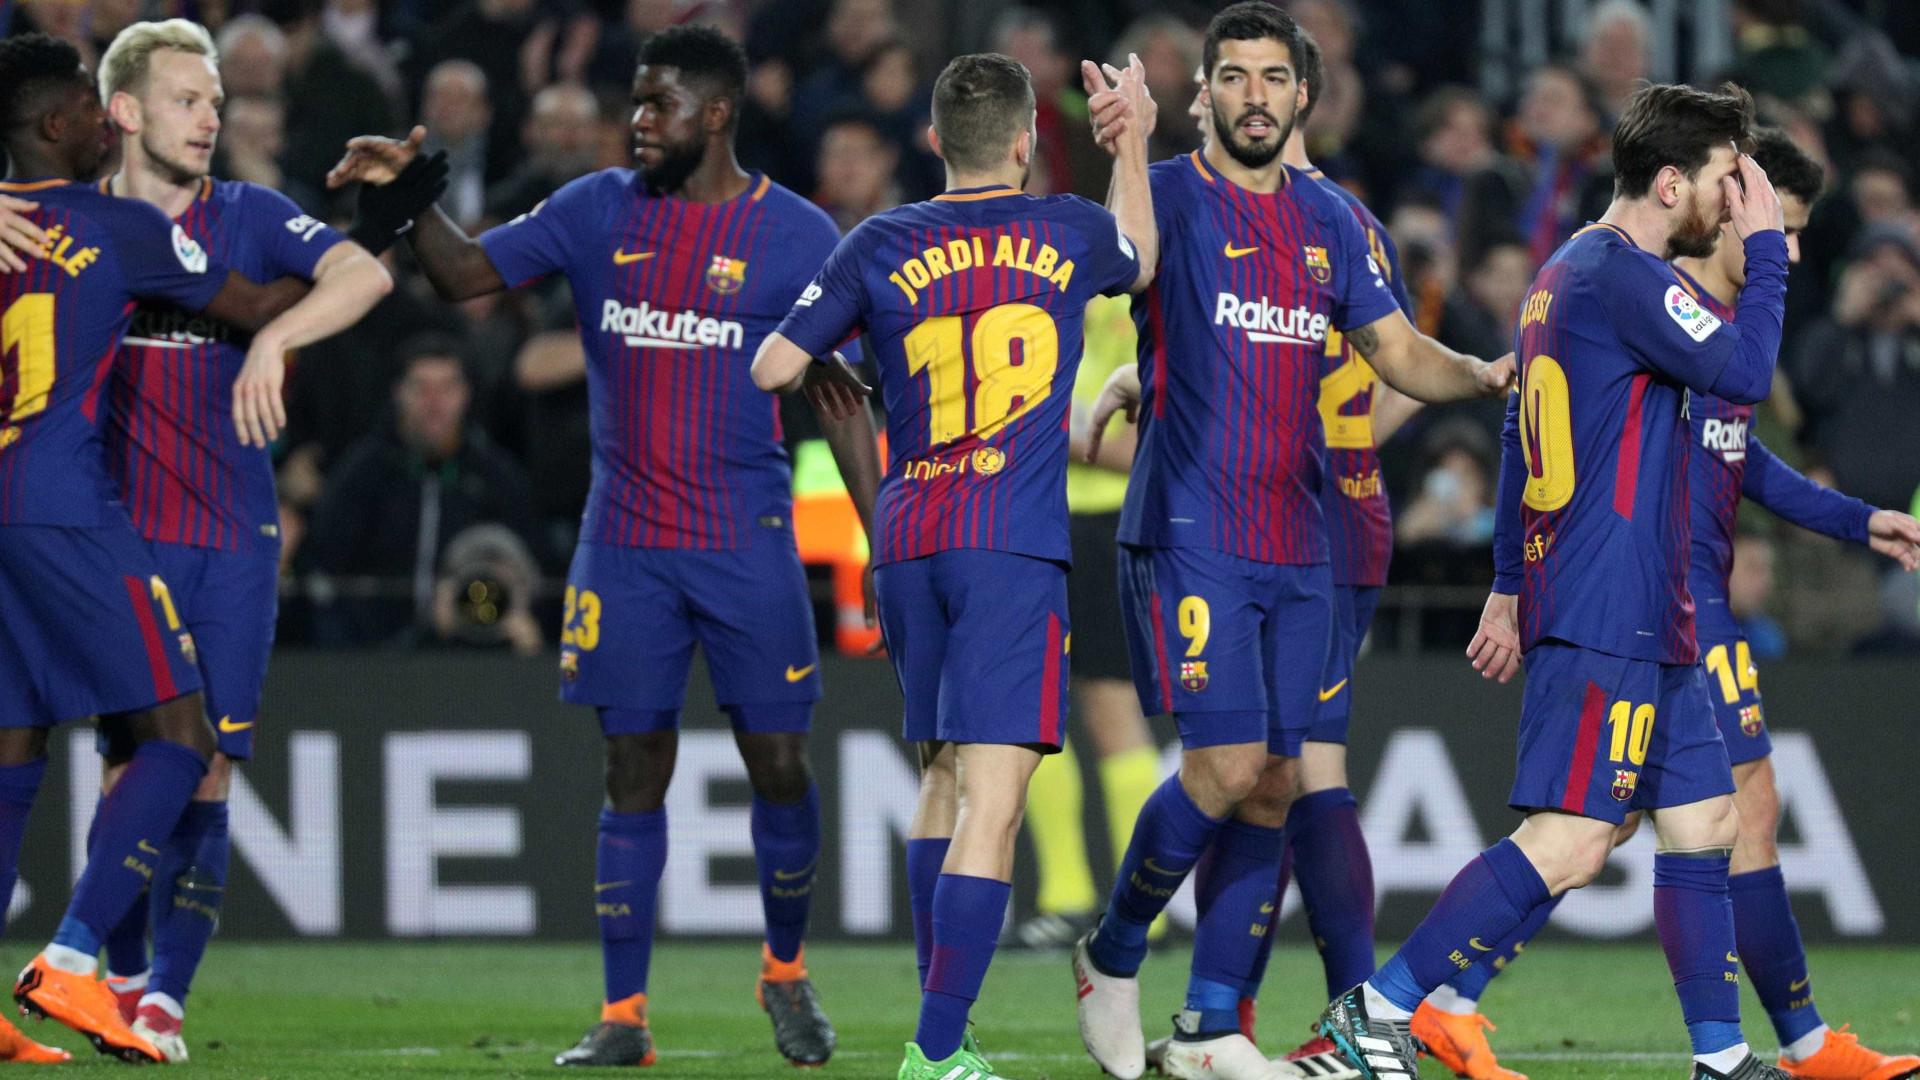 Barcelona impõe 'chapa 6' no dérbi com Girona